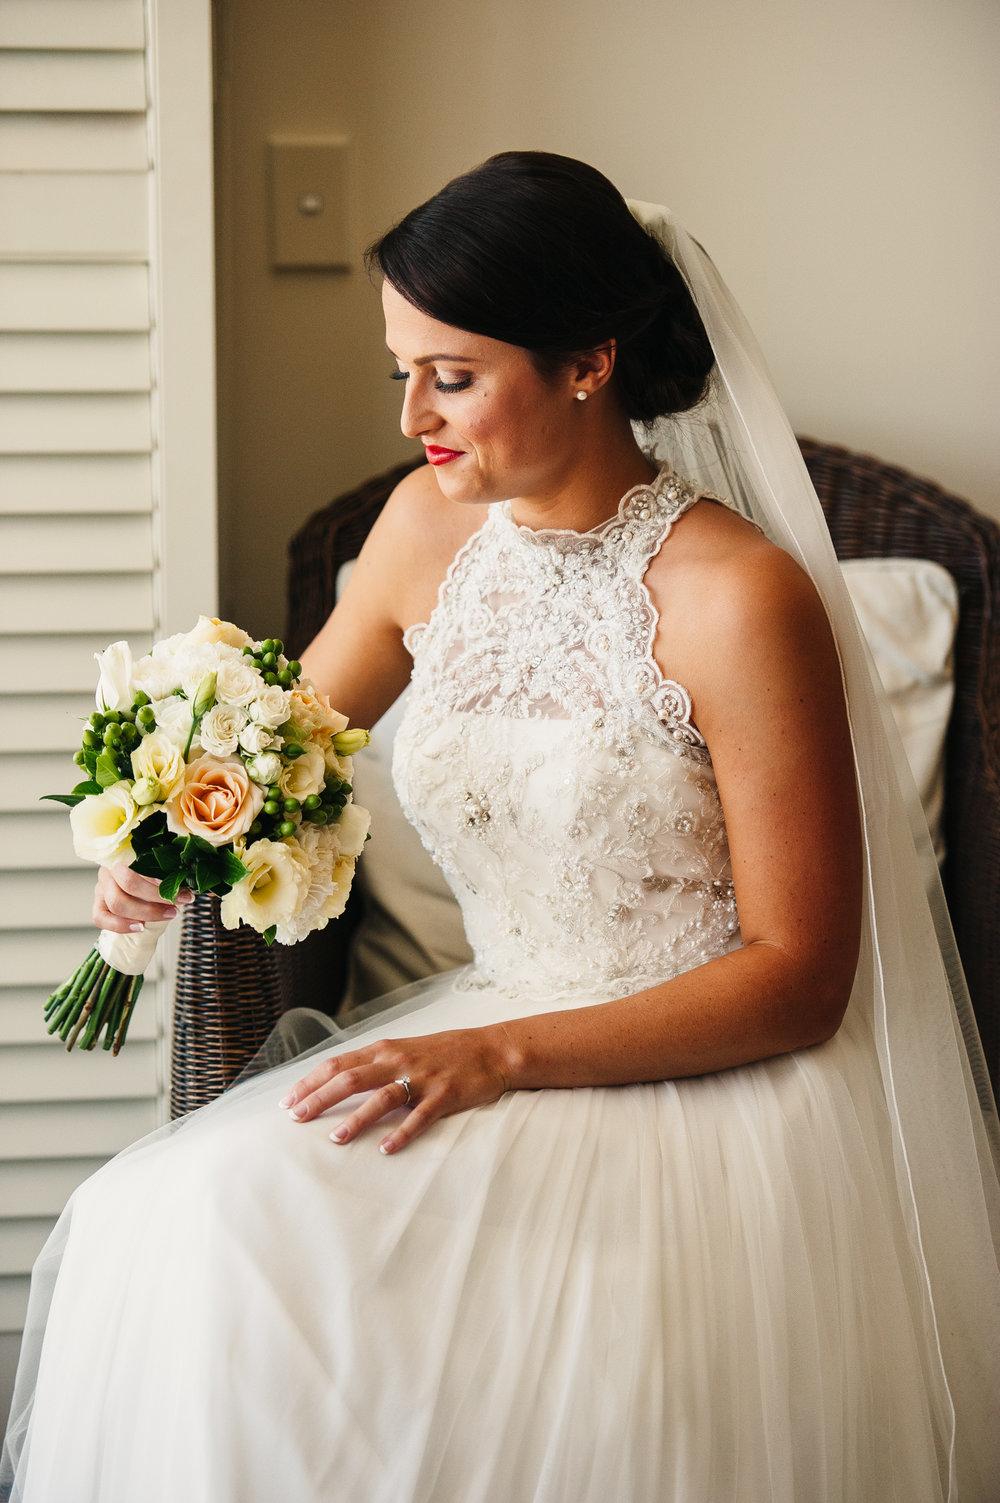 Osteria wedding_New Black Studios 21.jpg